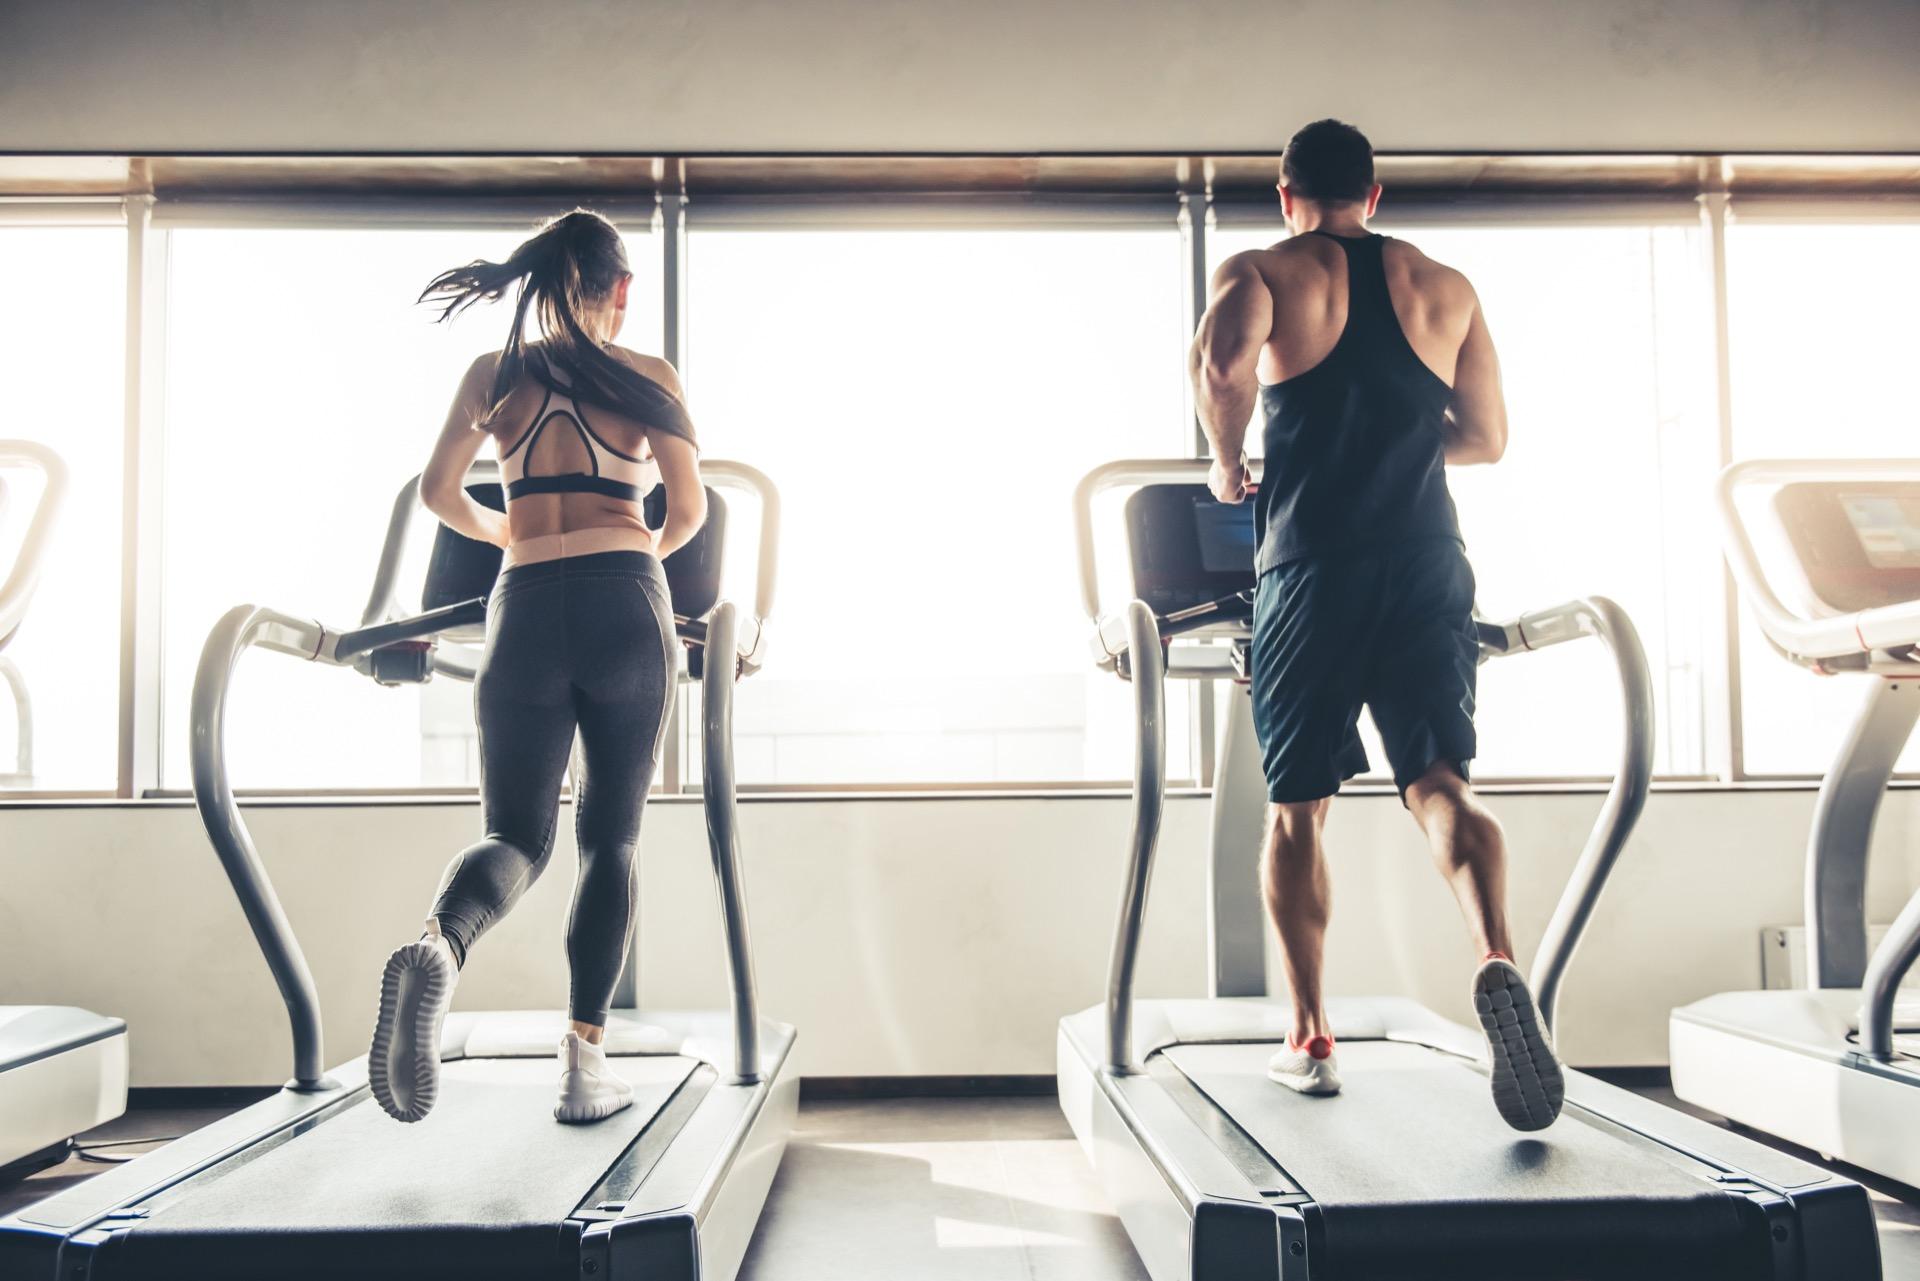 styrketrening forbrenning kalorier